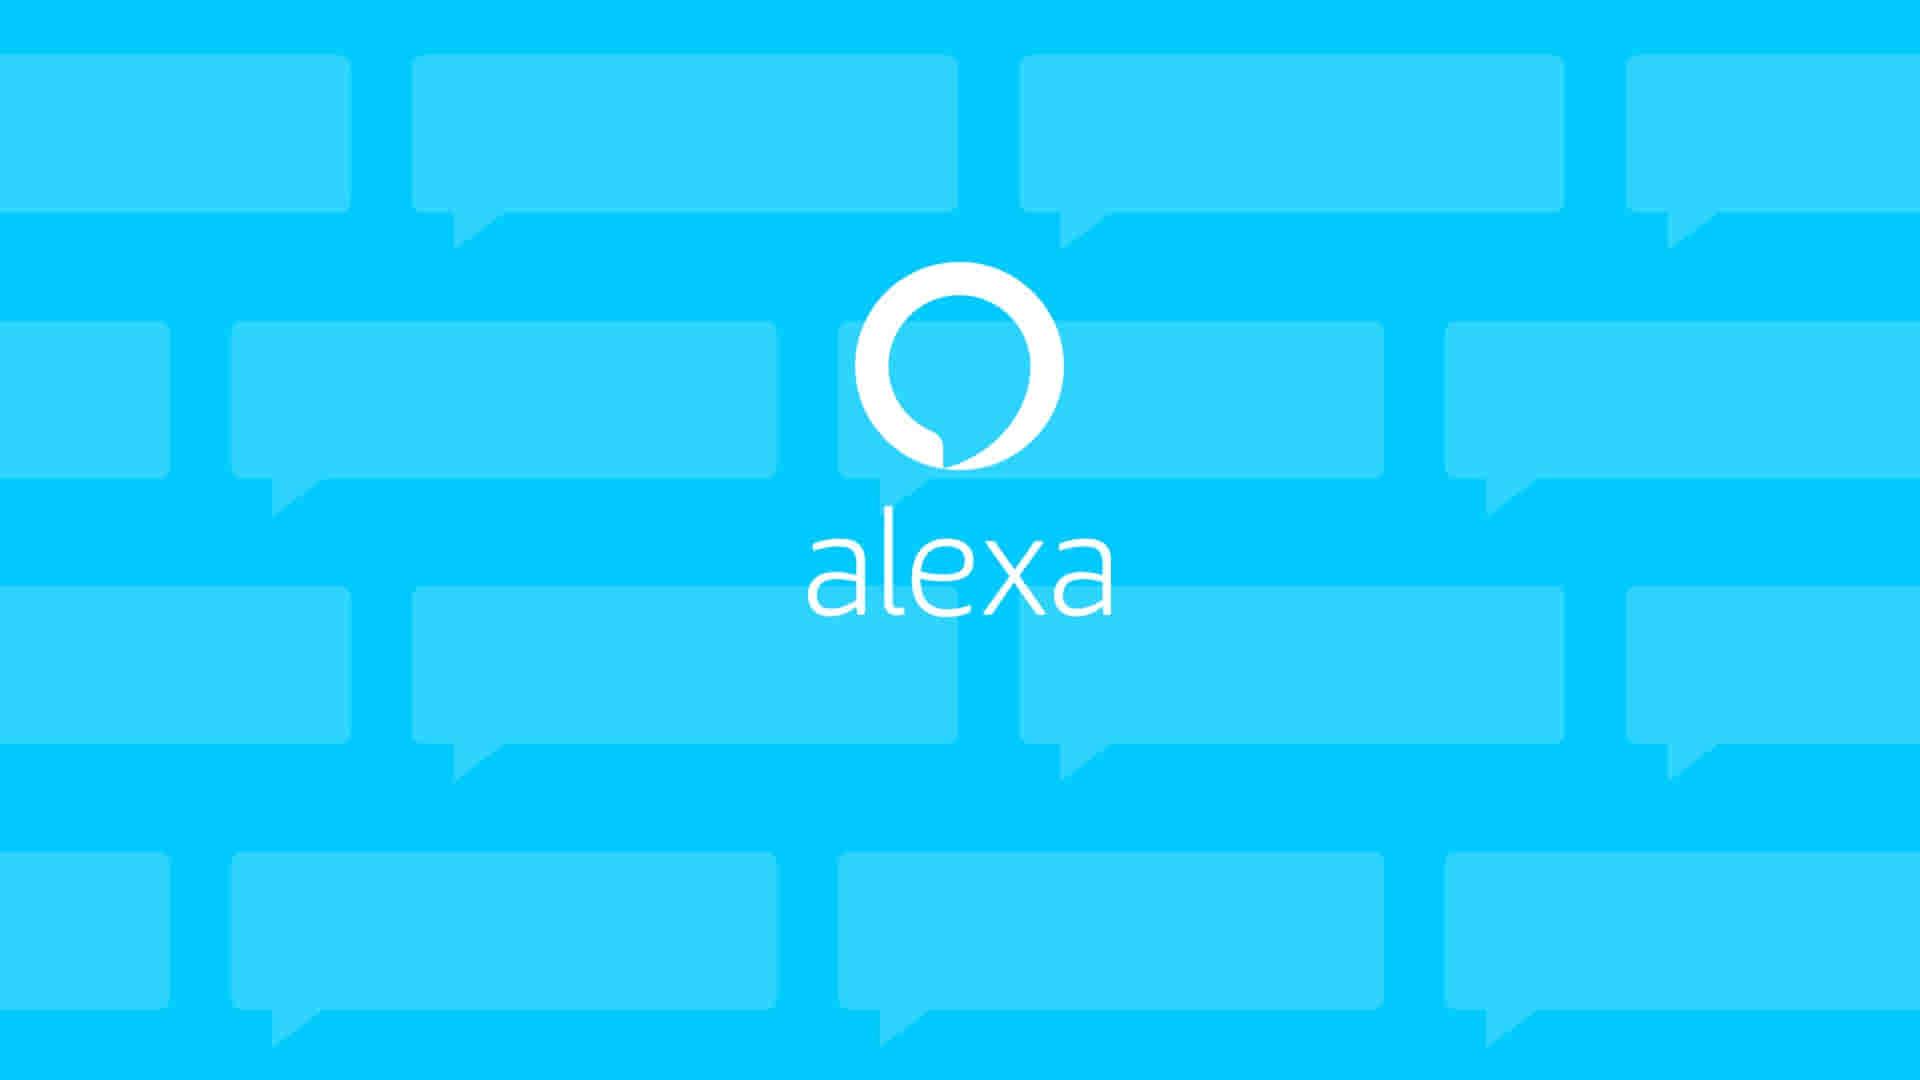 alexa tips and tricks, all new alexa tips and tricks, new alexa tips and tricks, interesting alexa tips and tricks, useful alexa tips and tricks, funny alexa tips and tricks, top 10 alexa tips and tricks